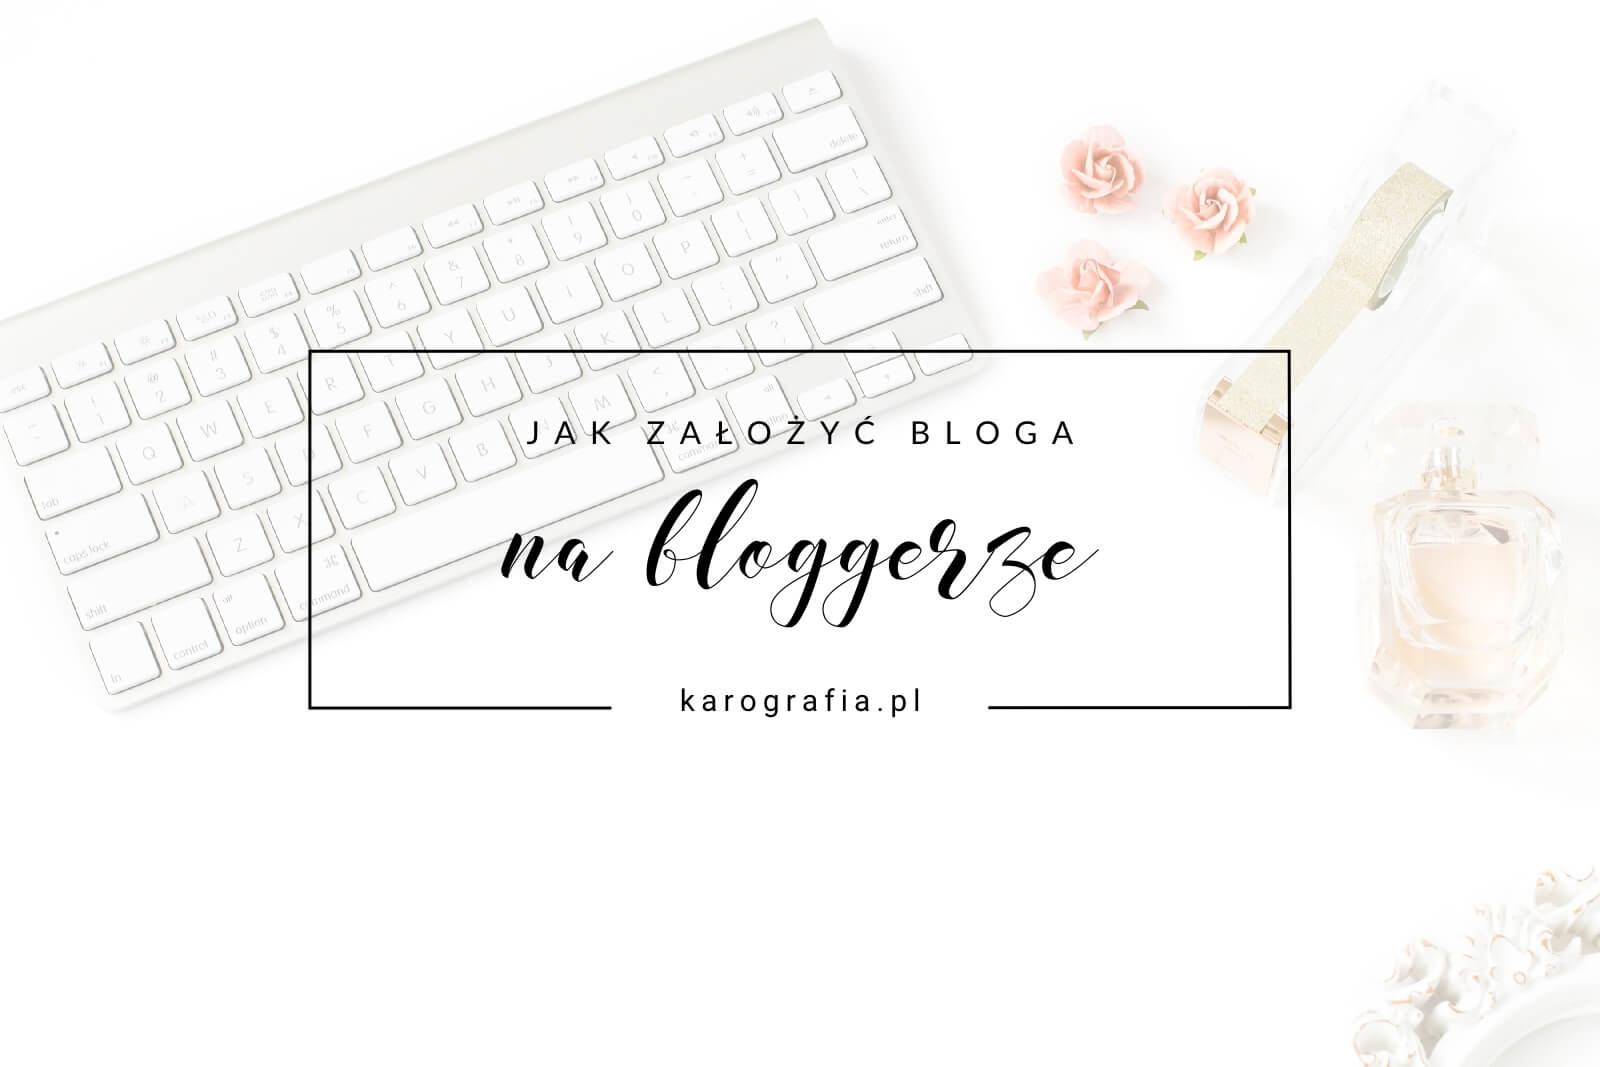 Jak założyć bloga na bloggerze (blogspocie)?